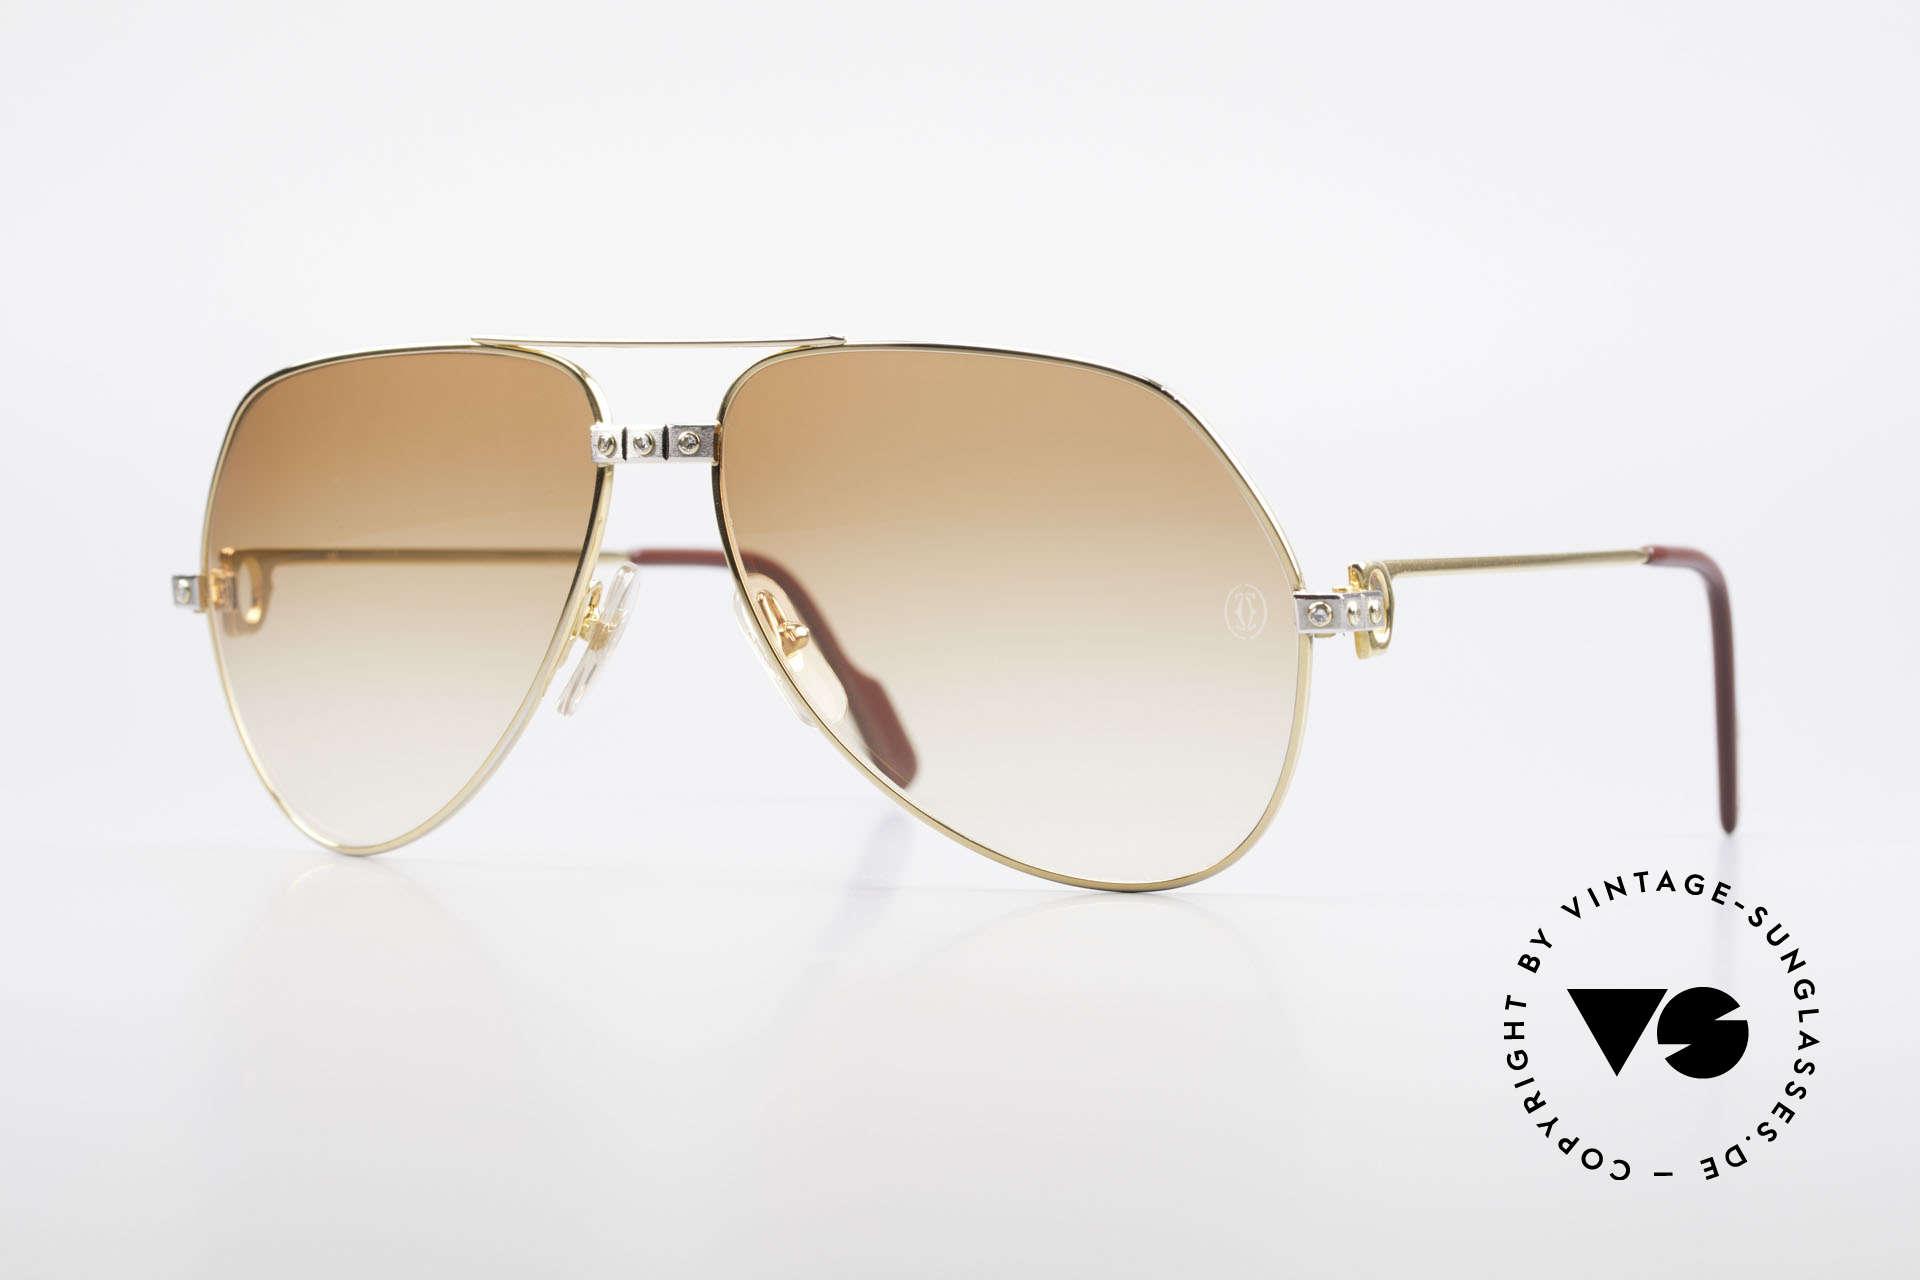 Cartier Vendome Santos - L Customized Diamond Shades, orig. vintage Cartier DIAMOND sunglasses from the 80's, Made for Men